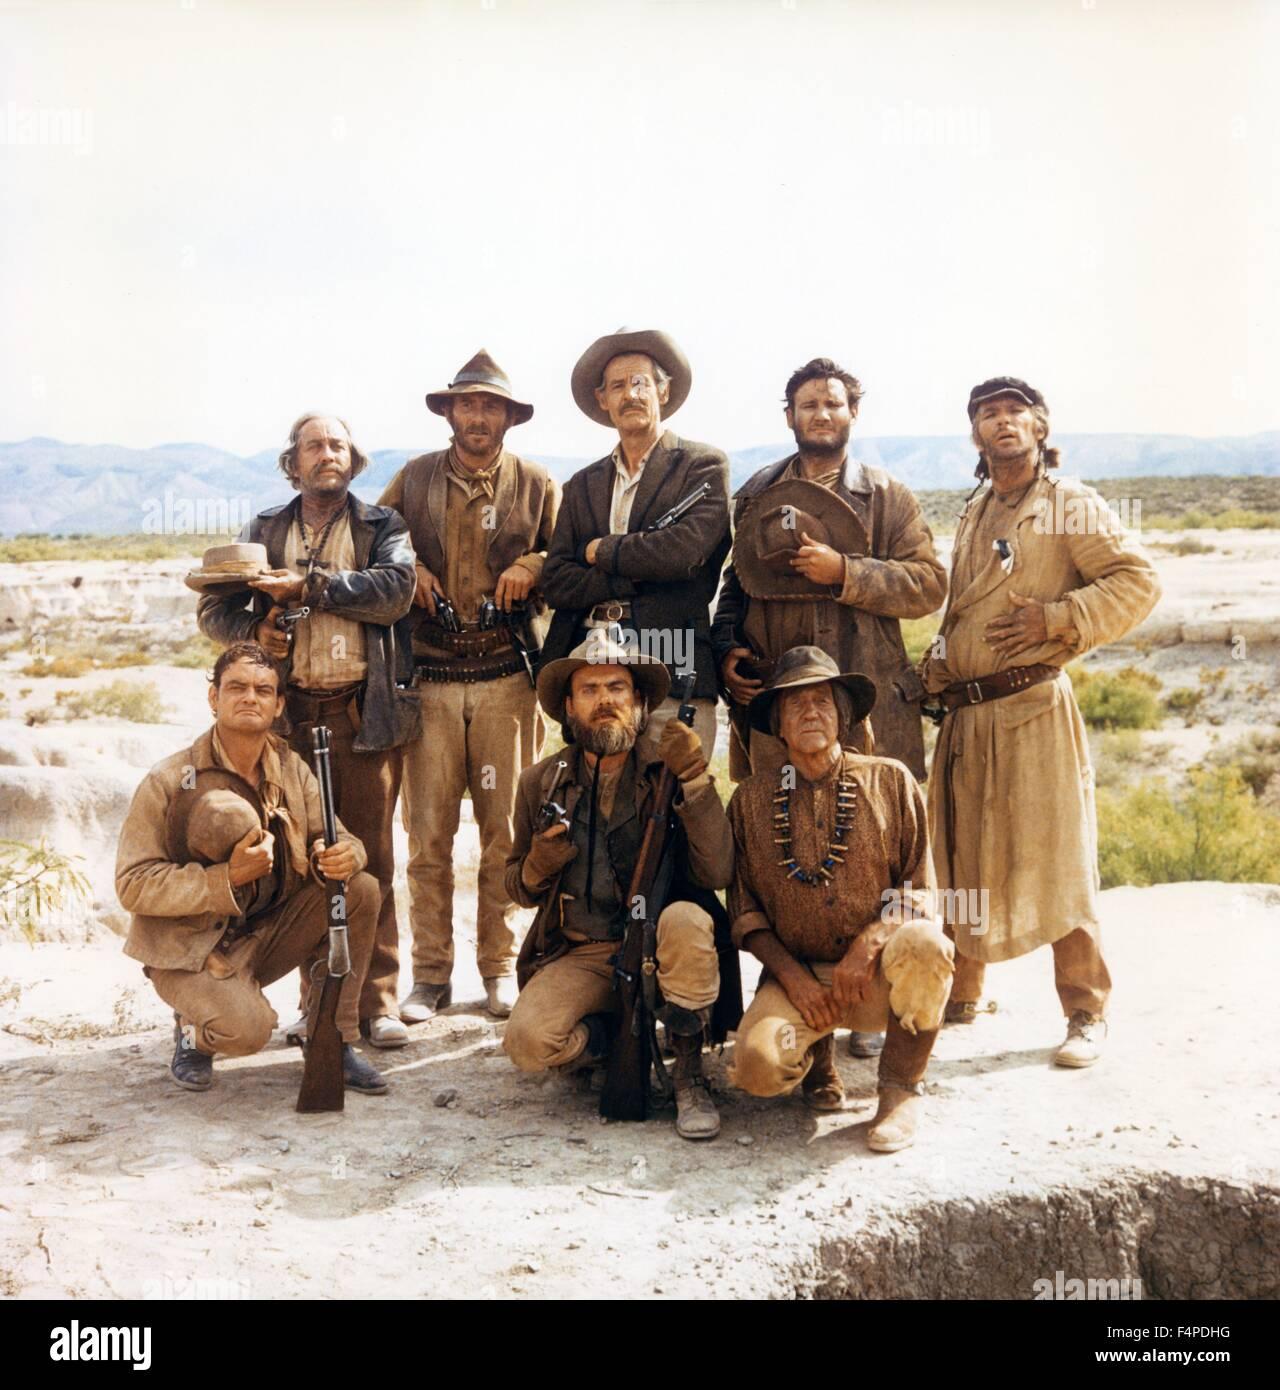 Robert Ryan / Wild Bunch 1969 dirigida por Sam Peckinpah Foto de stock